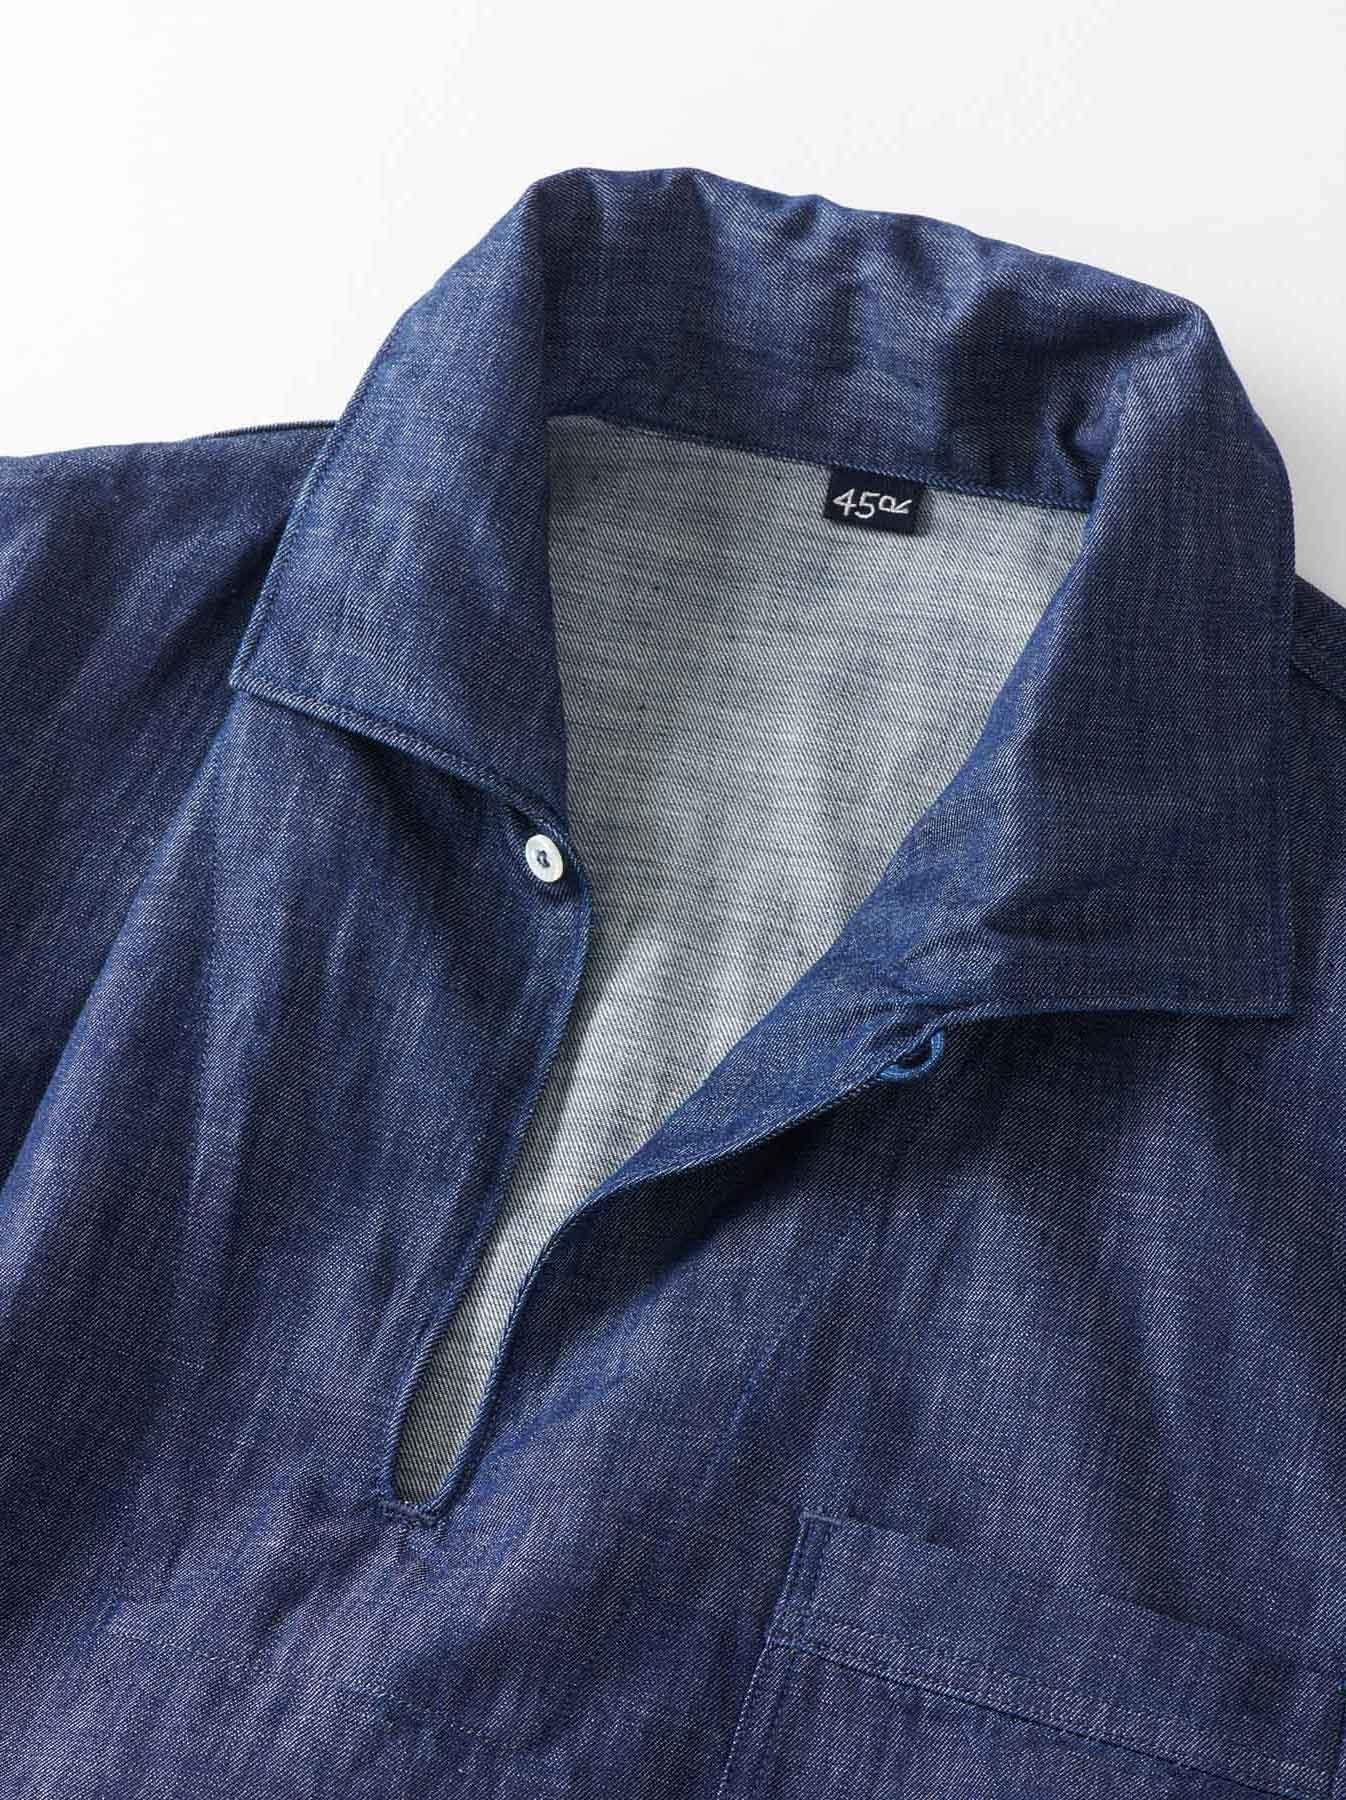 WH Goma Denim Umahiko Pullover Shirt-6